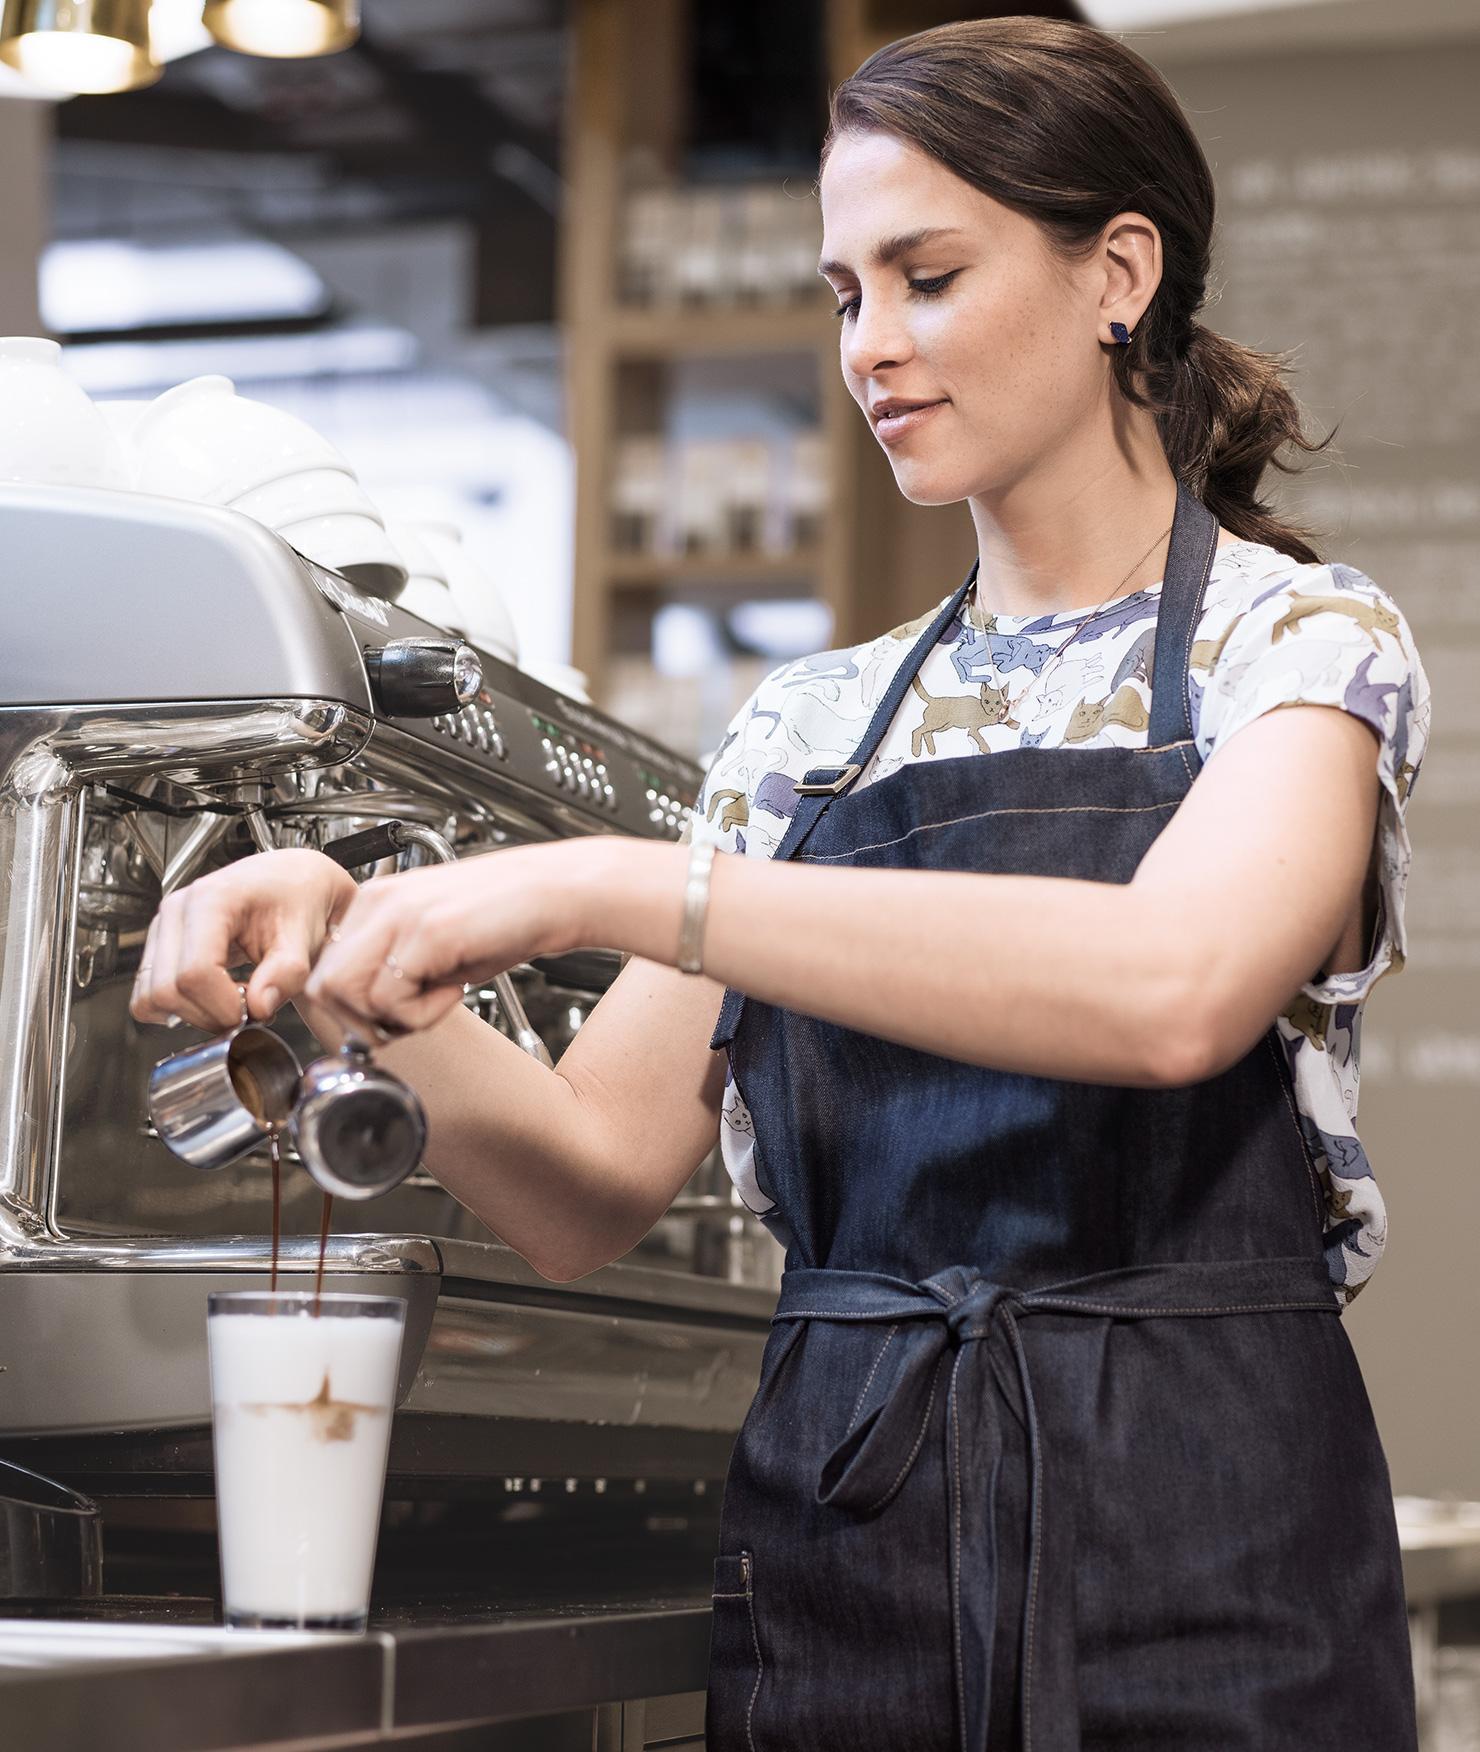 BRITA filter AquaAroma Crema koffie barista